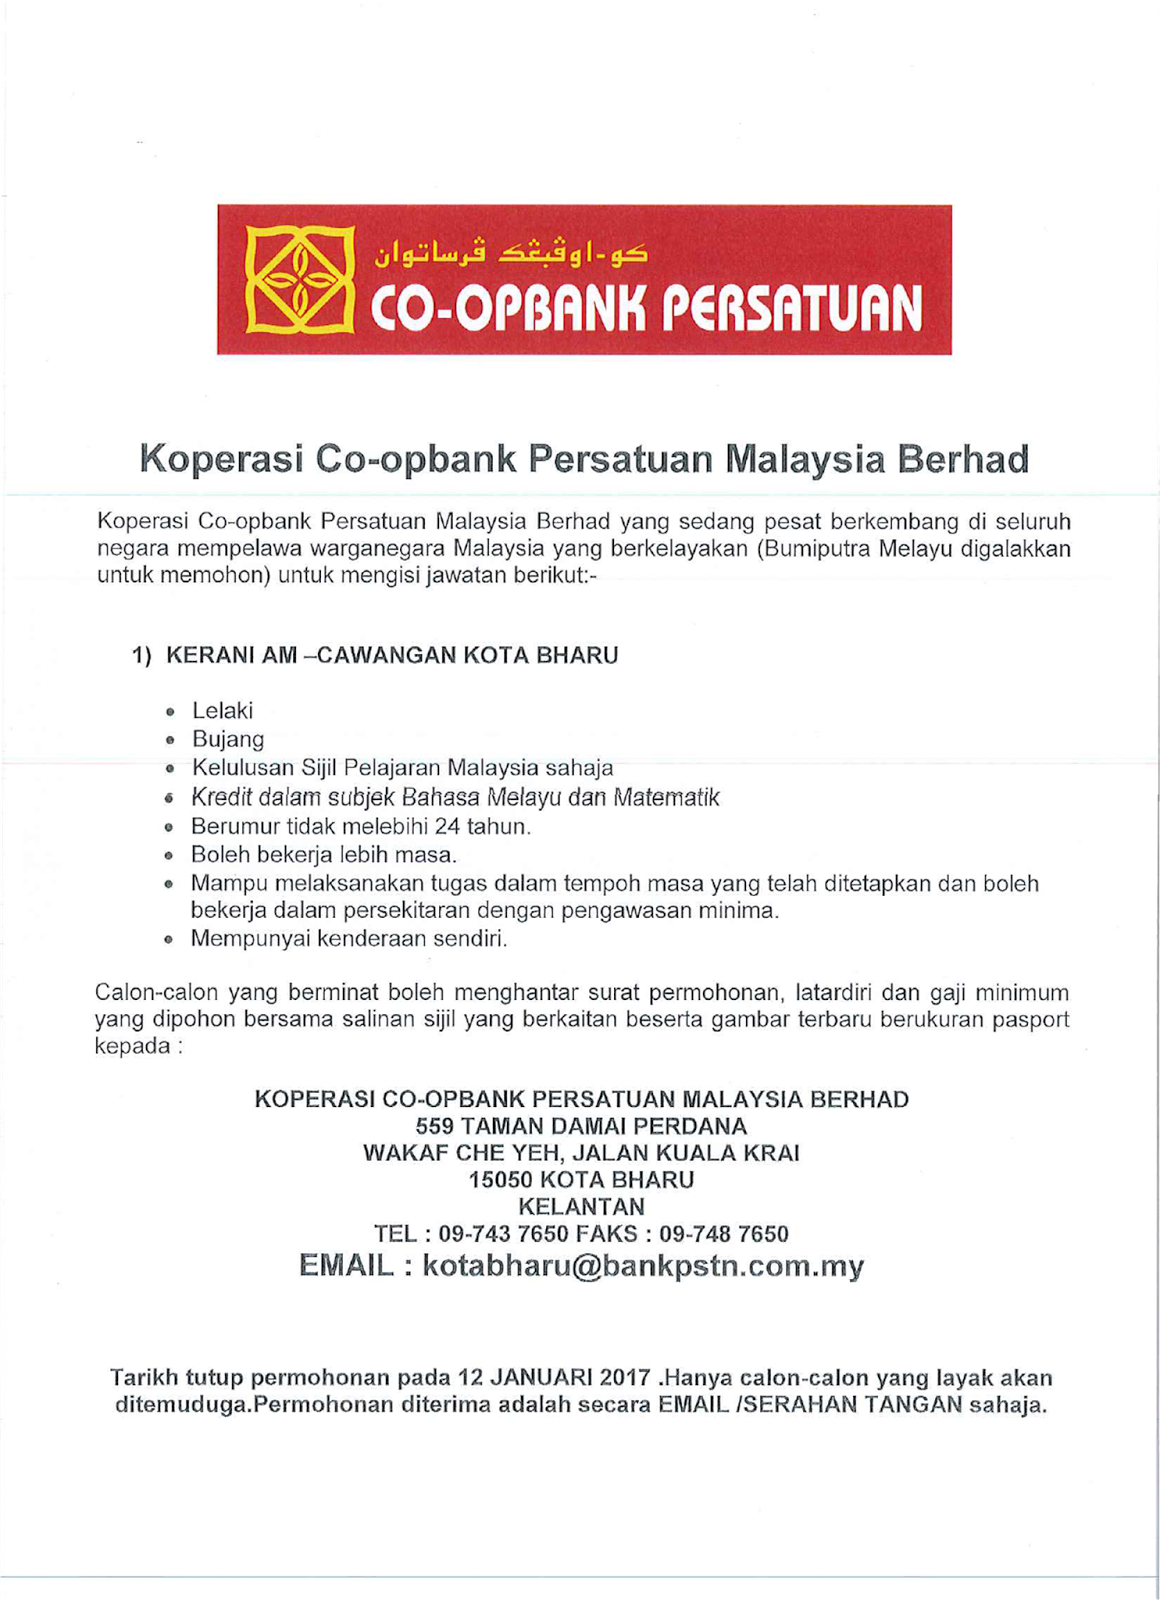 Jawatan Kosong Pemandu Lori Gdl Johor Bahru Jawat Koso